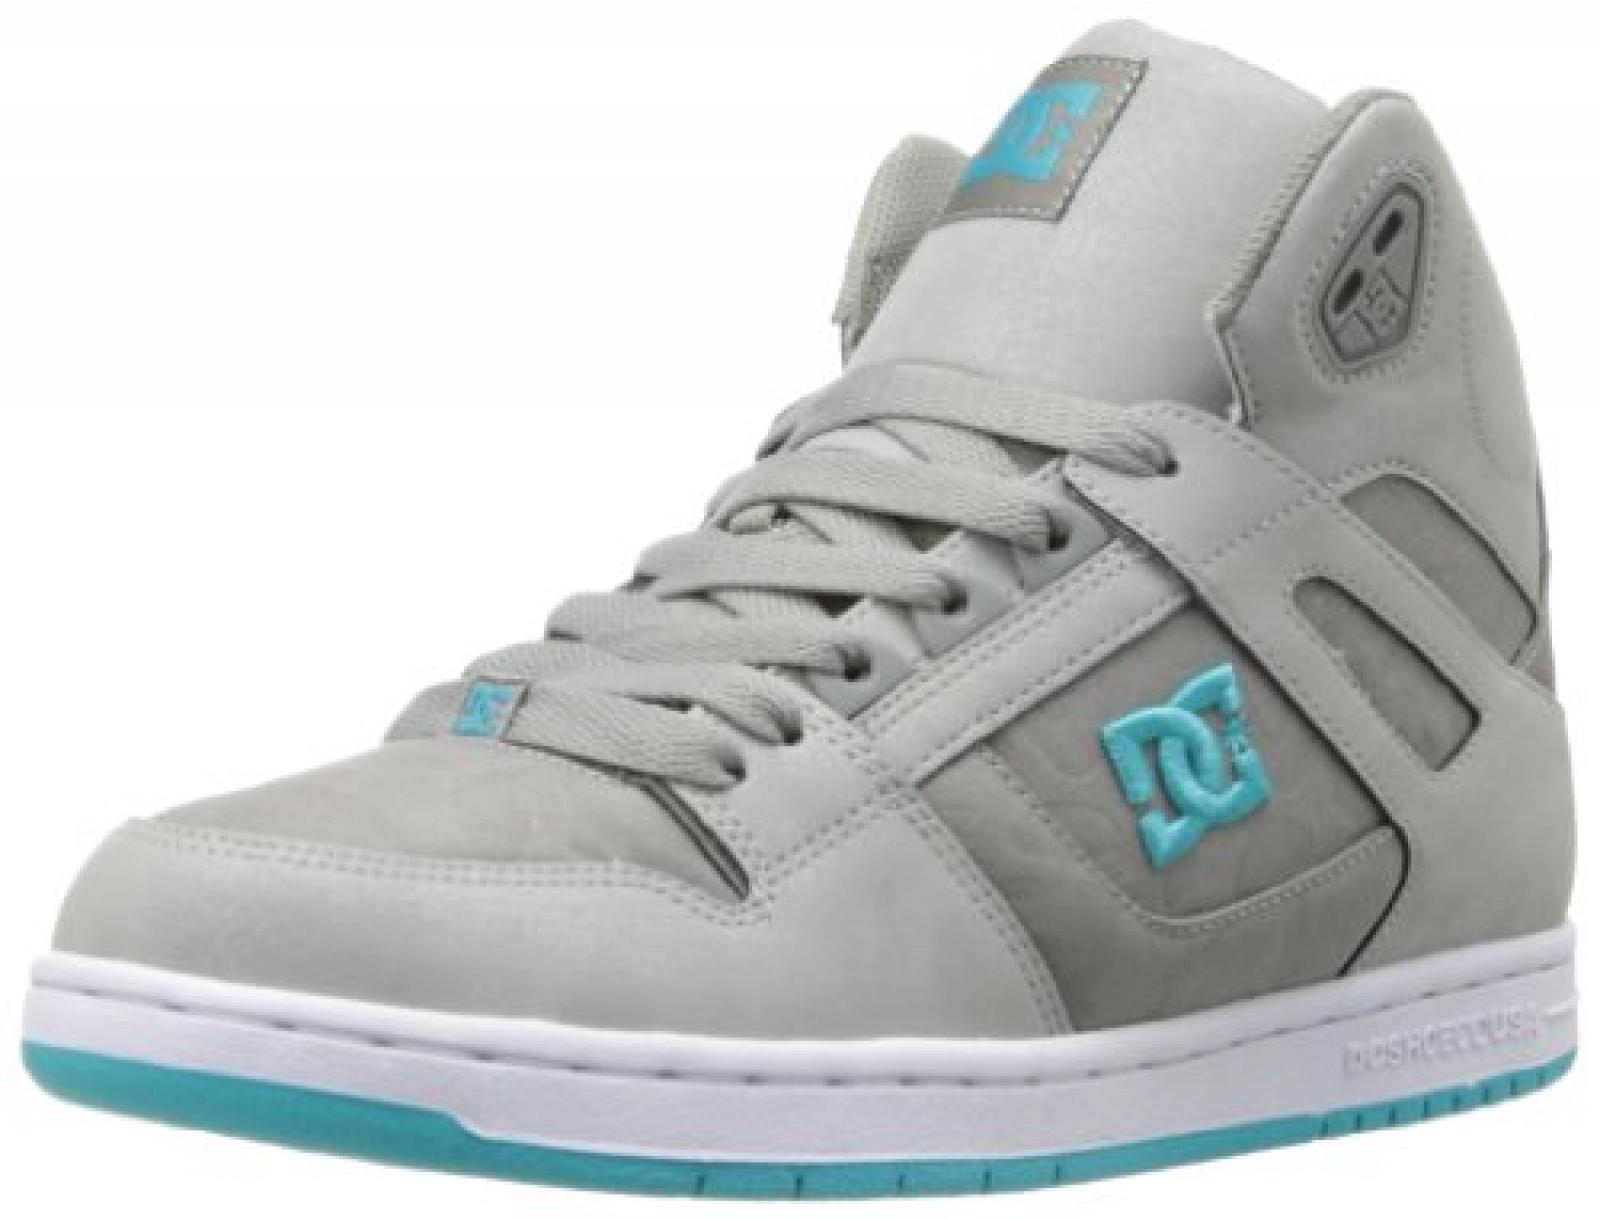 DC REBOUND HIGH Damen Hohe Sneakers